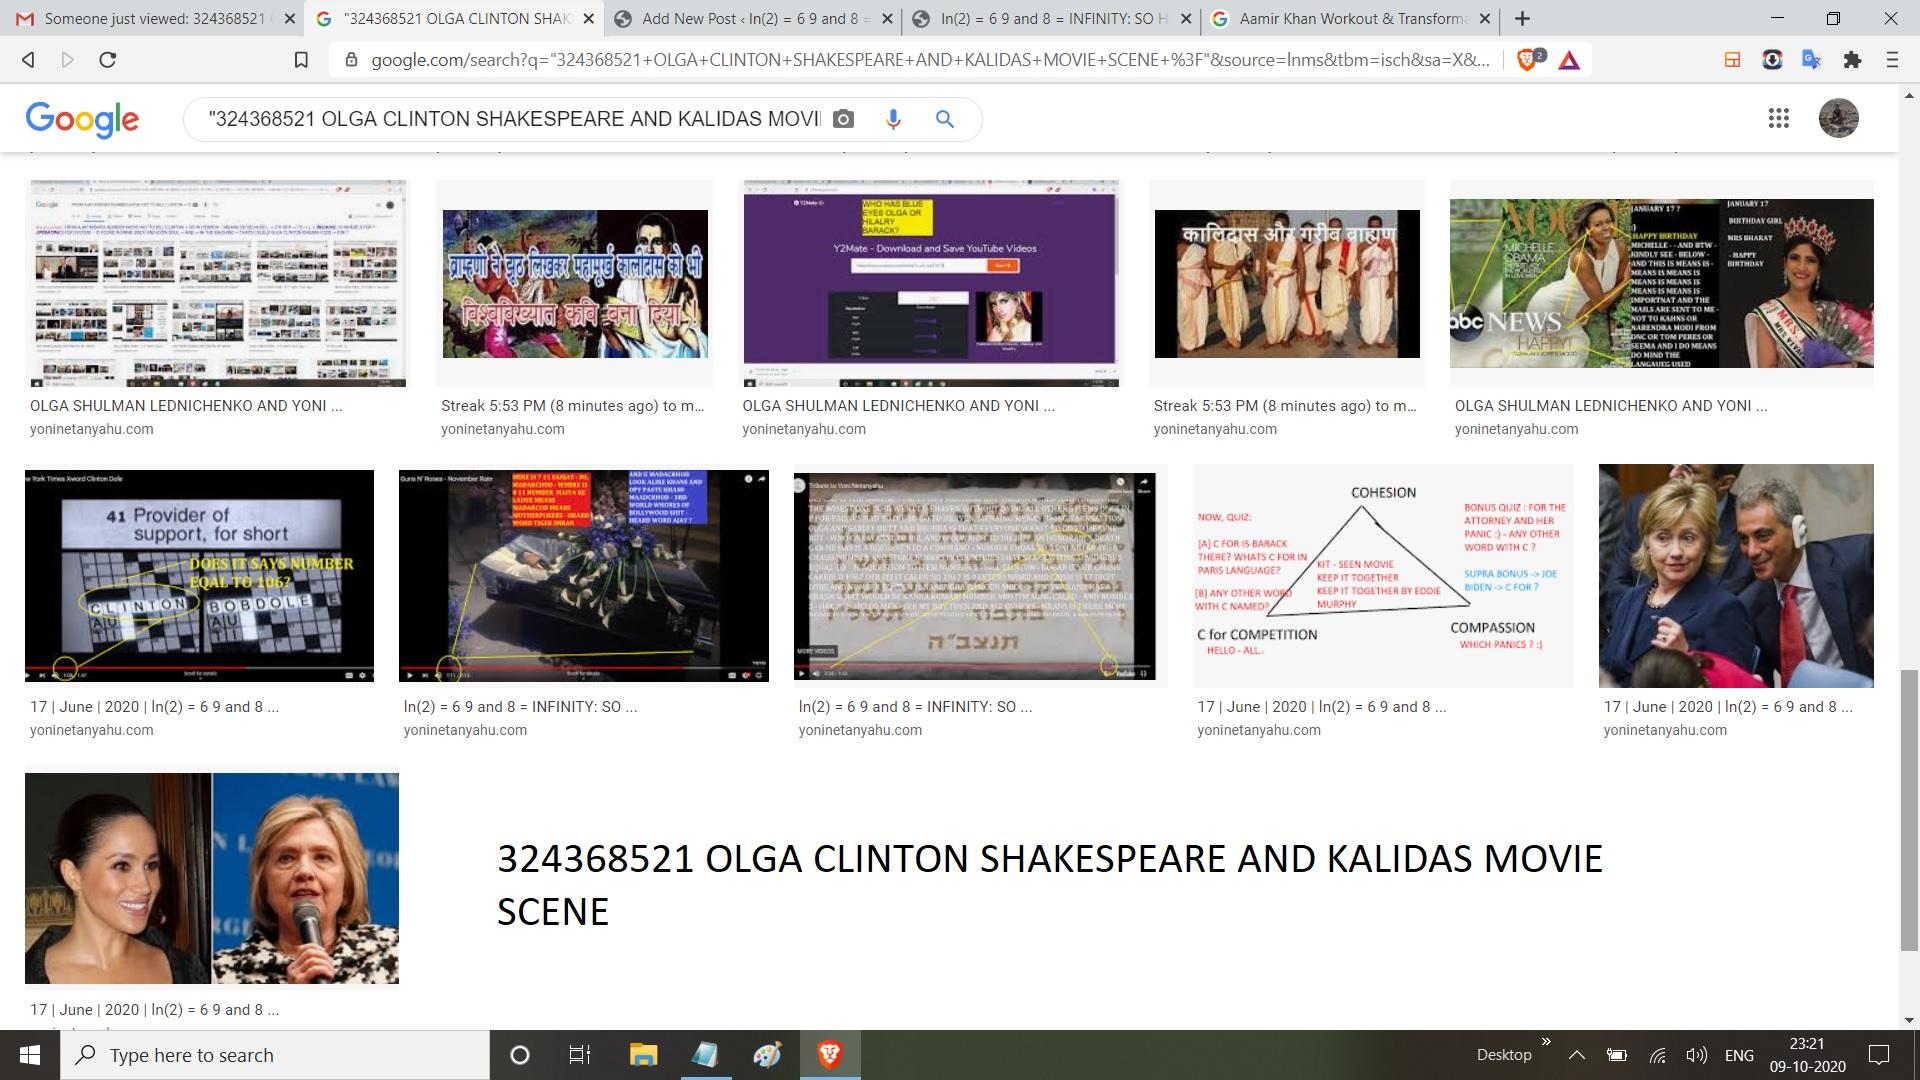 324368521 OLGA CLINTON SHAKESPEARE AND KALIDAS MOVIE SCENE